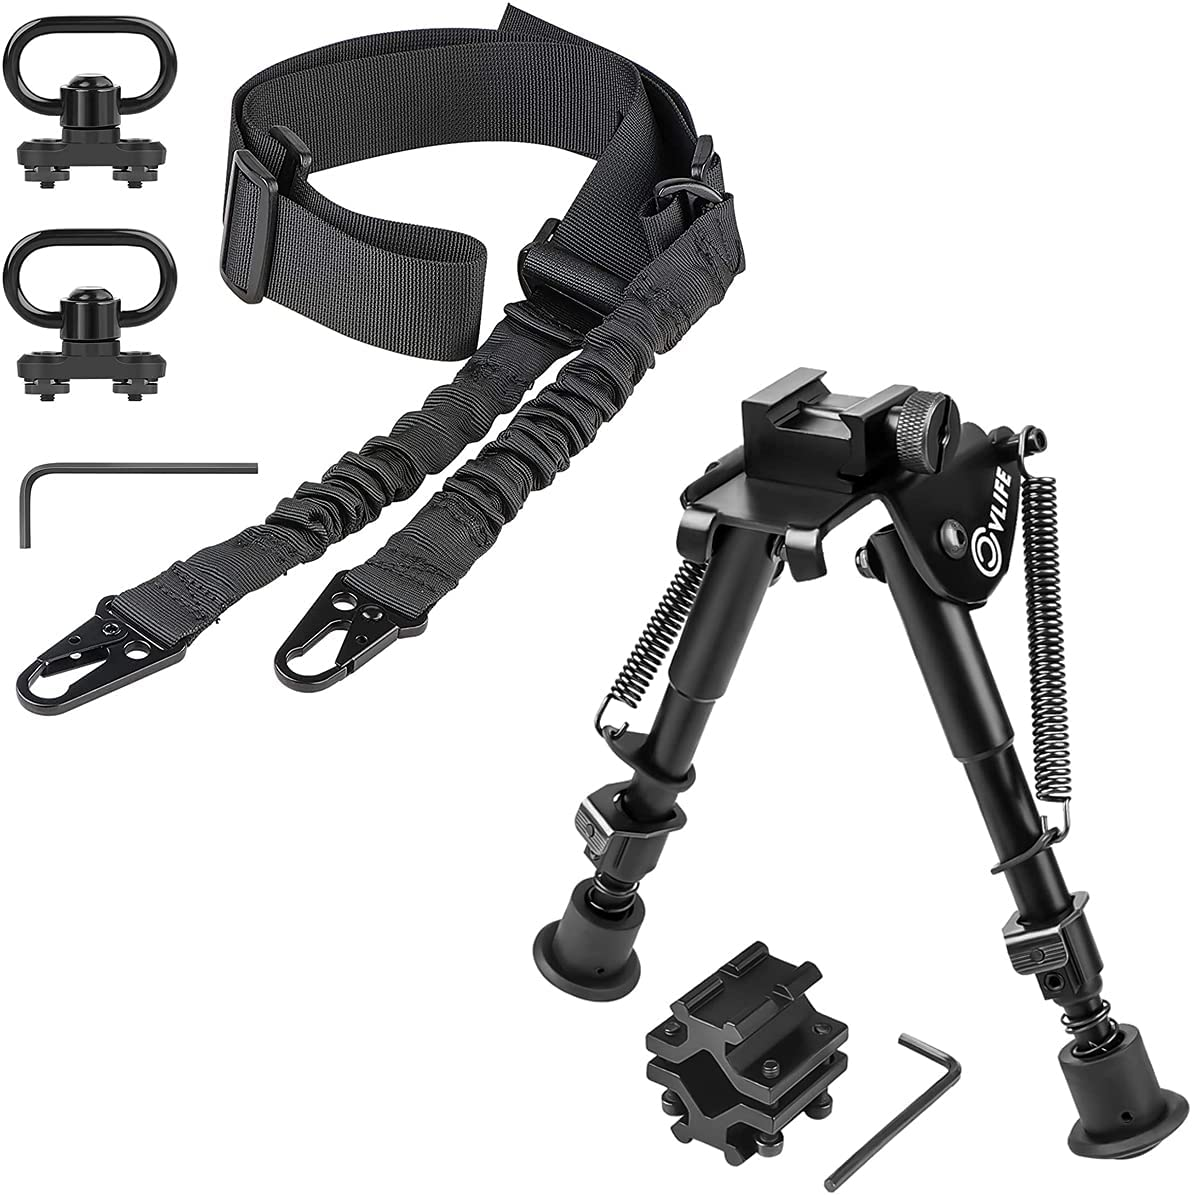 CVLIFE 春の新作シューズ満載 Rifle Sling 2 Point with QD Mo 価格 Pack Swivels